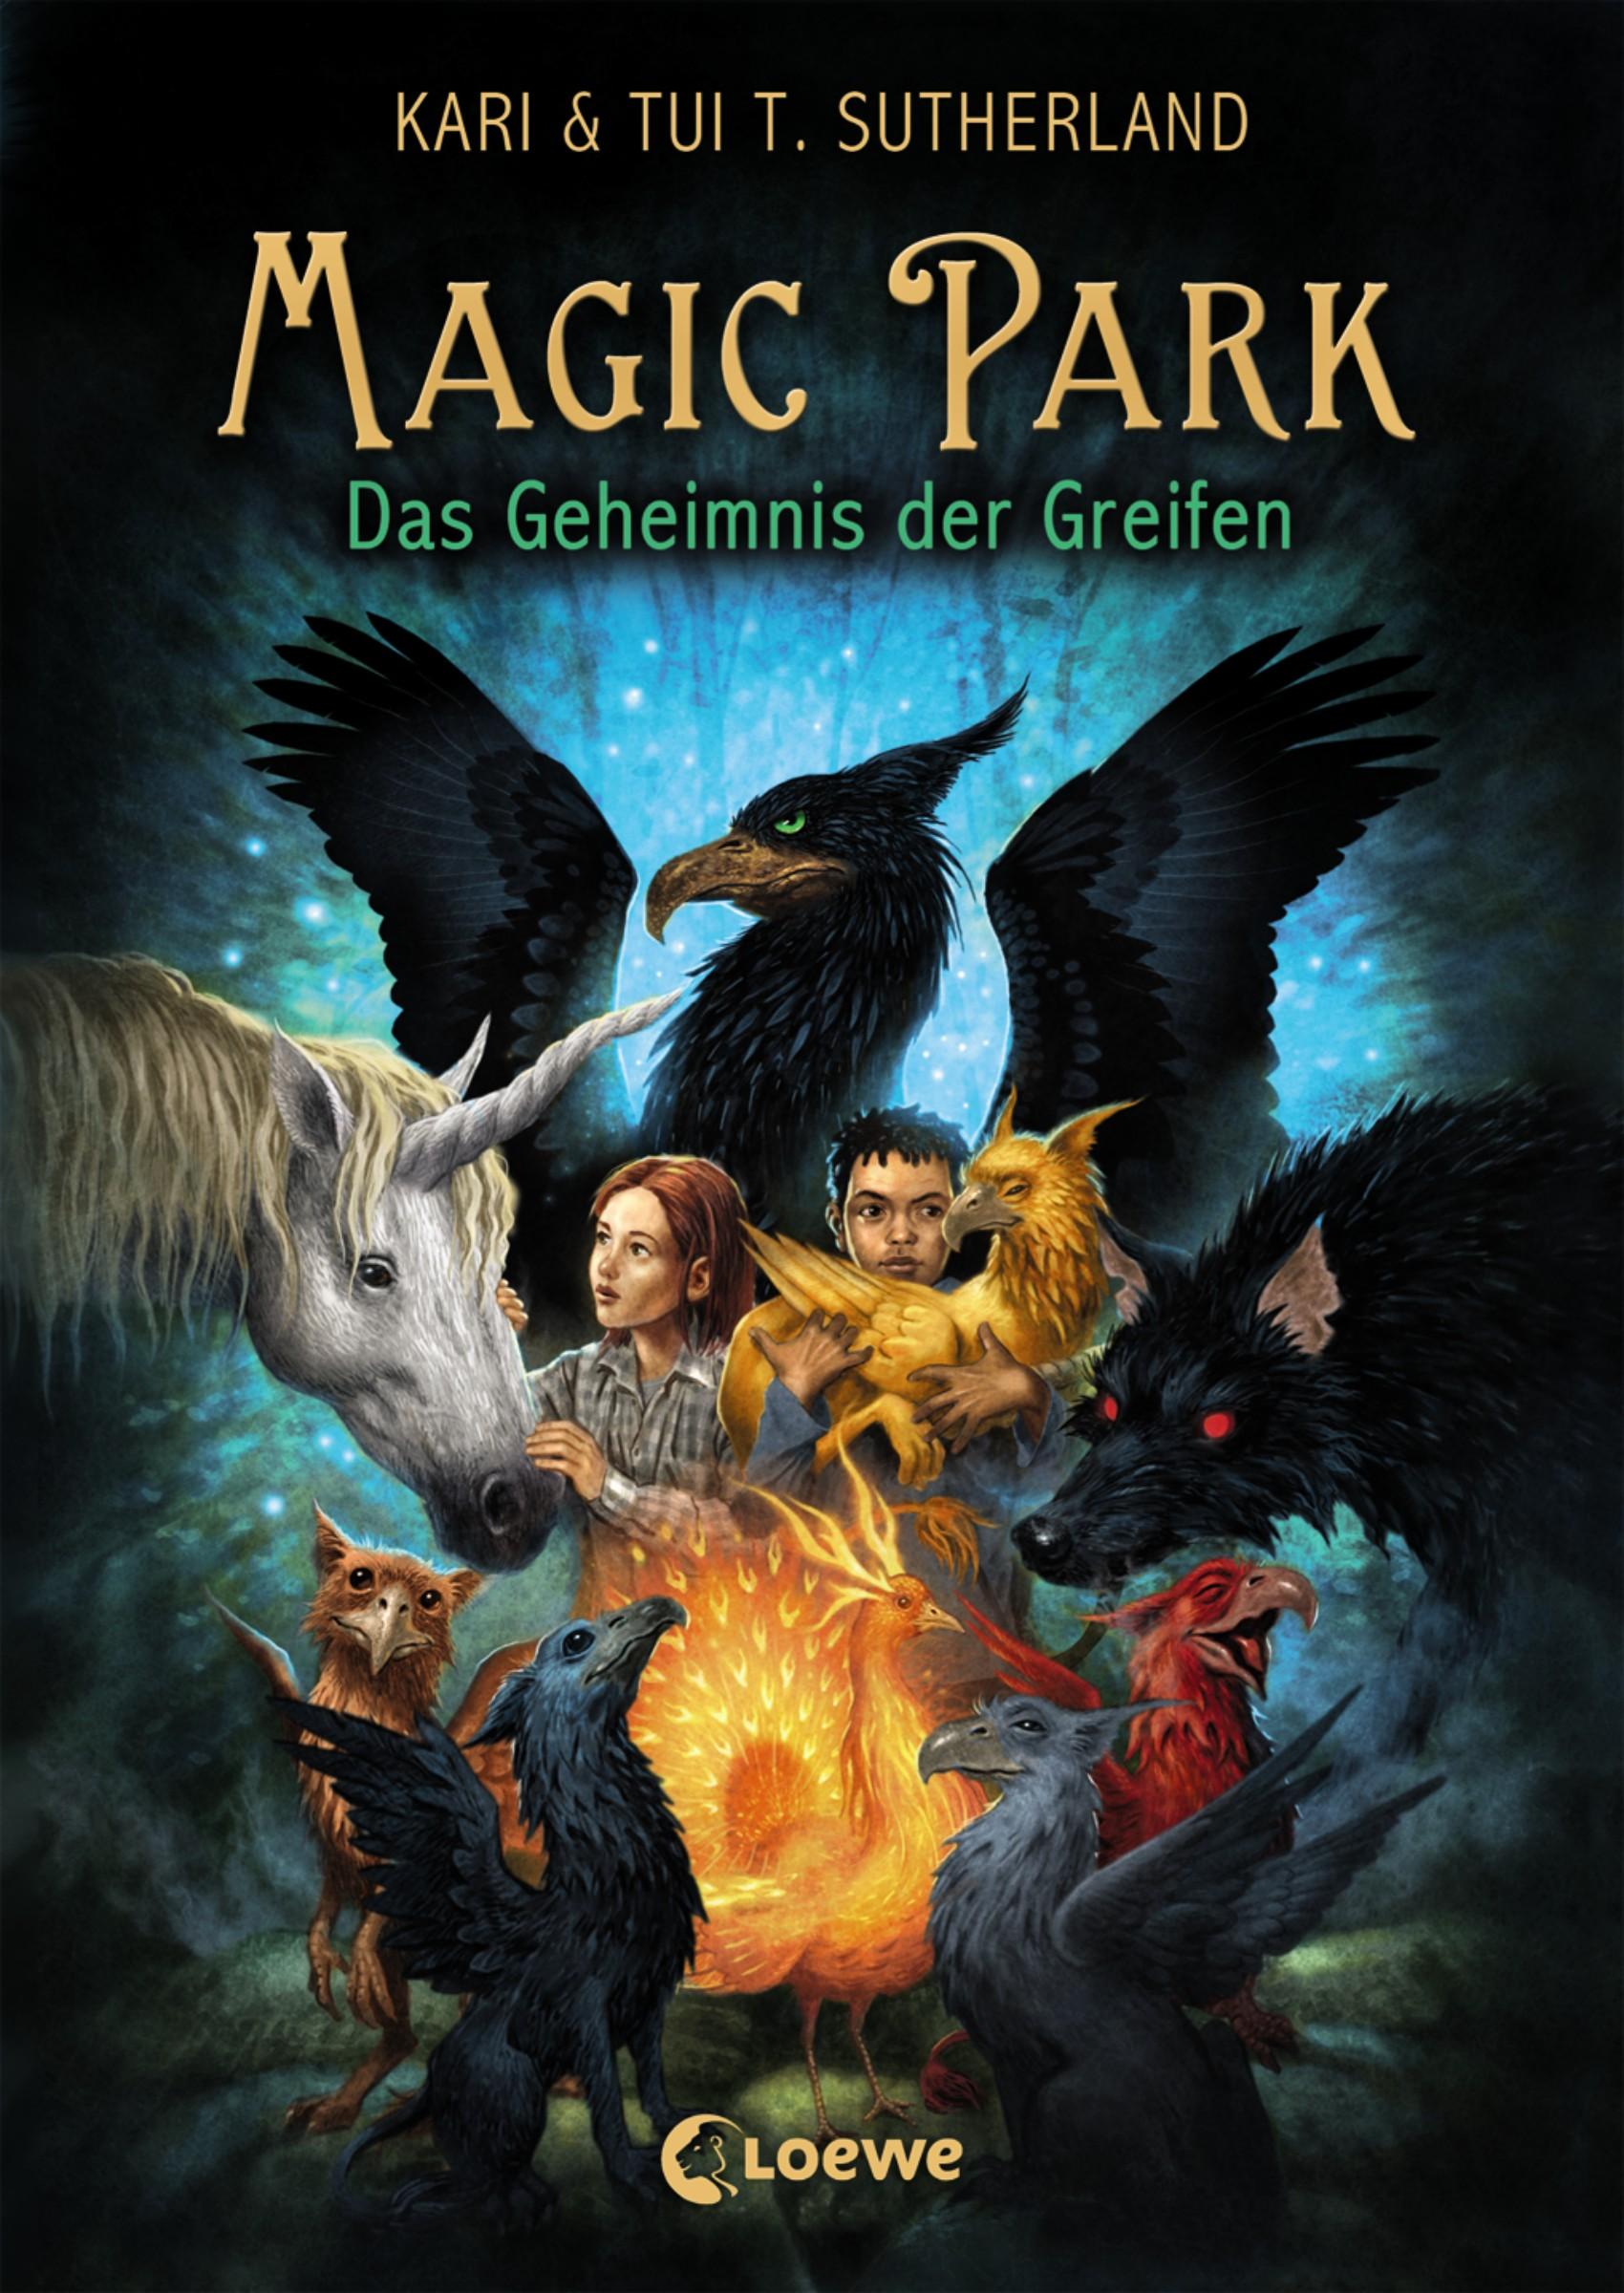 Kari Sutherland Magic Park 1 - Das Geheimnis des Greifen набор аэропорт kari 11 предм bt908951a kari